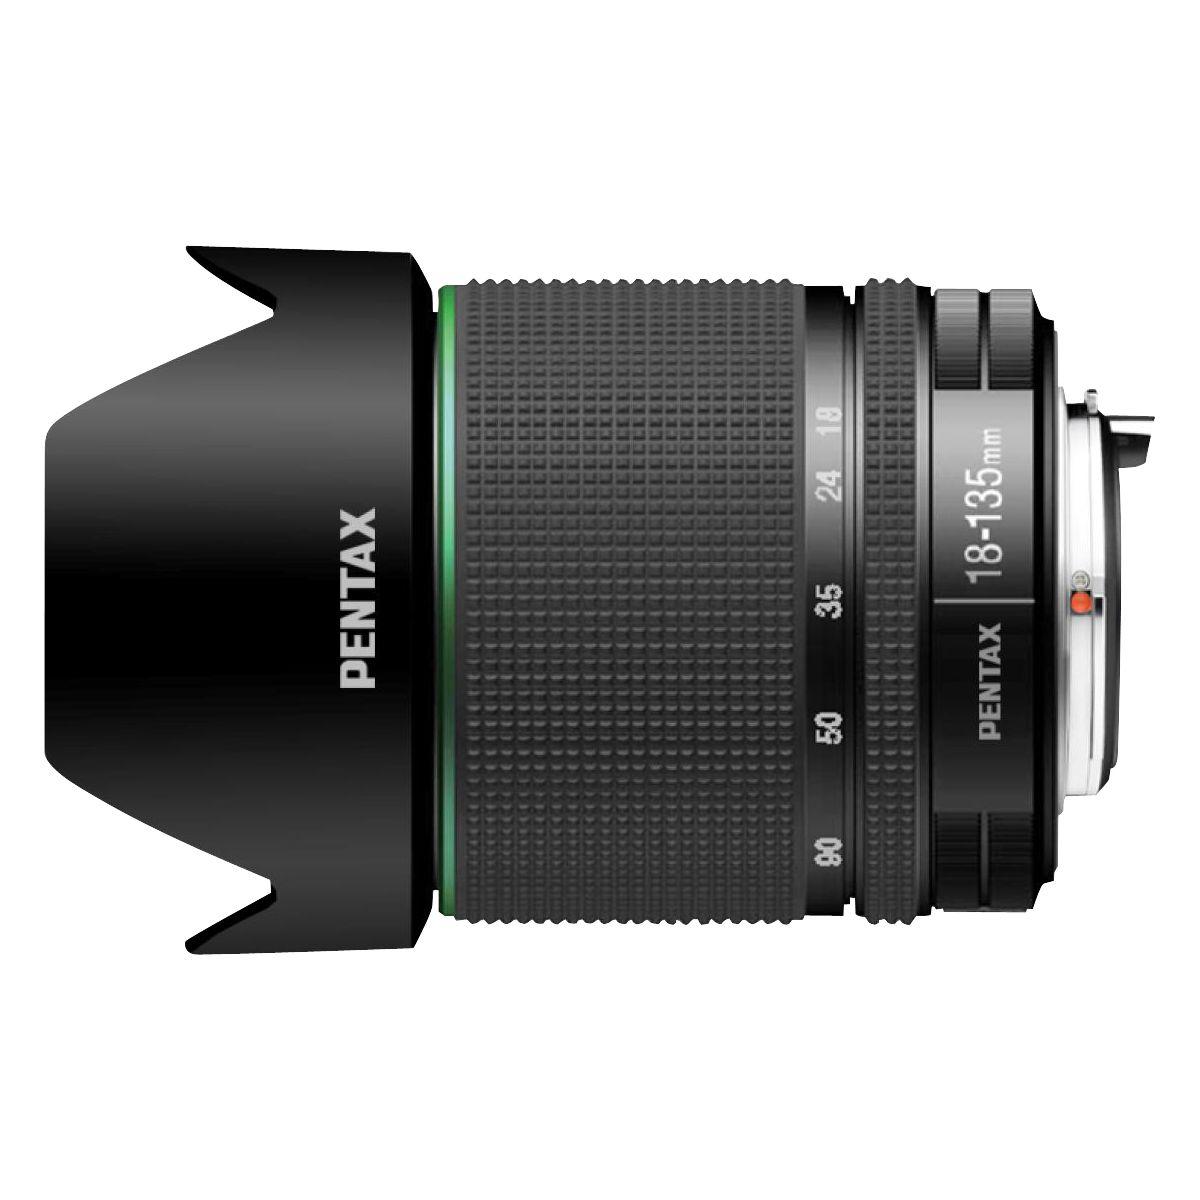 Objectif PENTAX 18-135MM F/3.5-5.6 ED AL (IF) WR (pour reflex PENTAX)